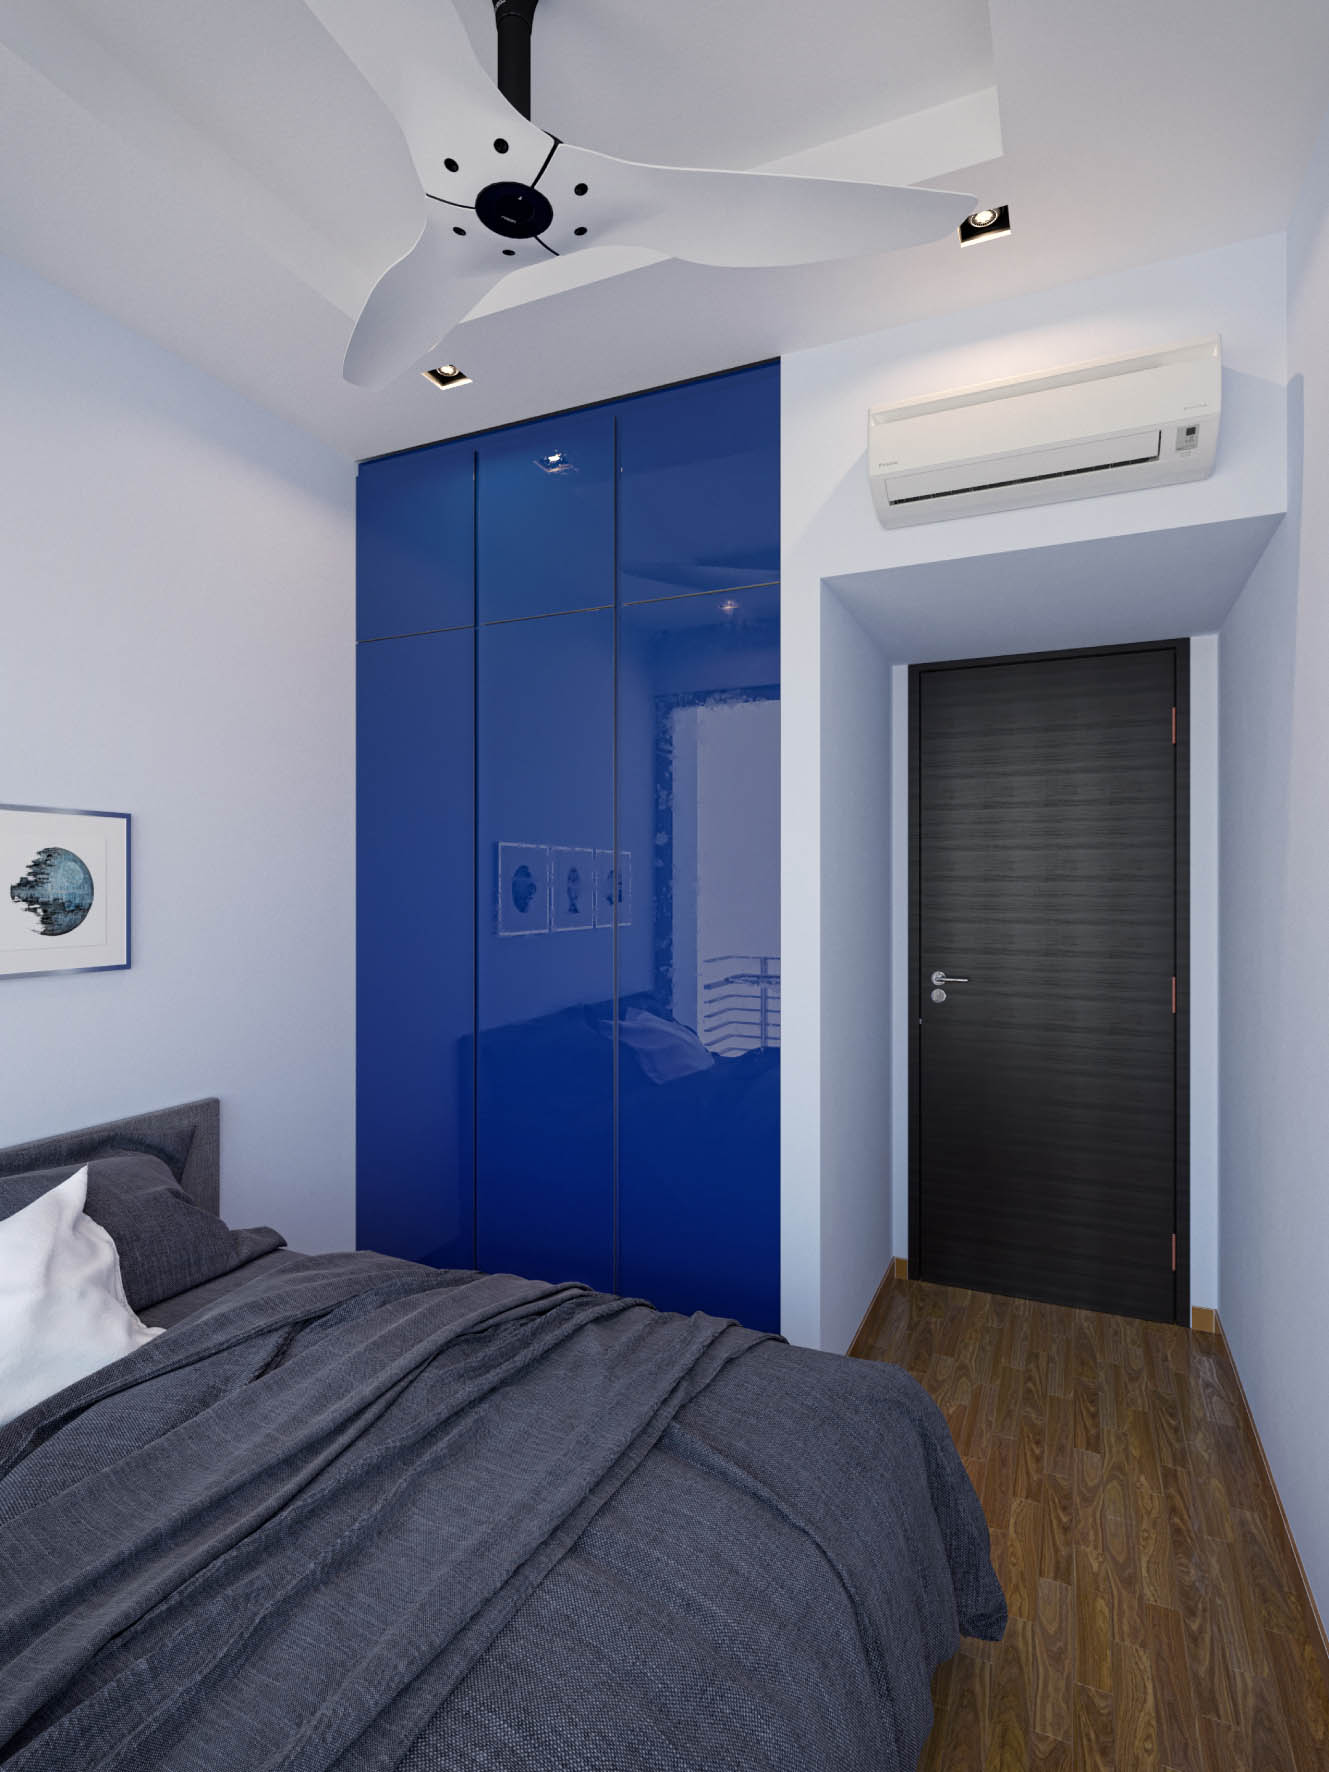 07 - Boy's Room